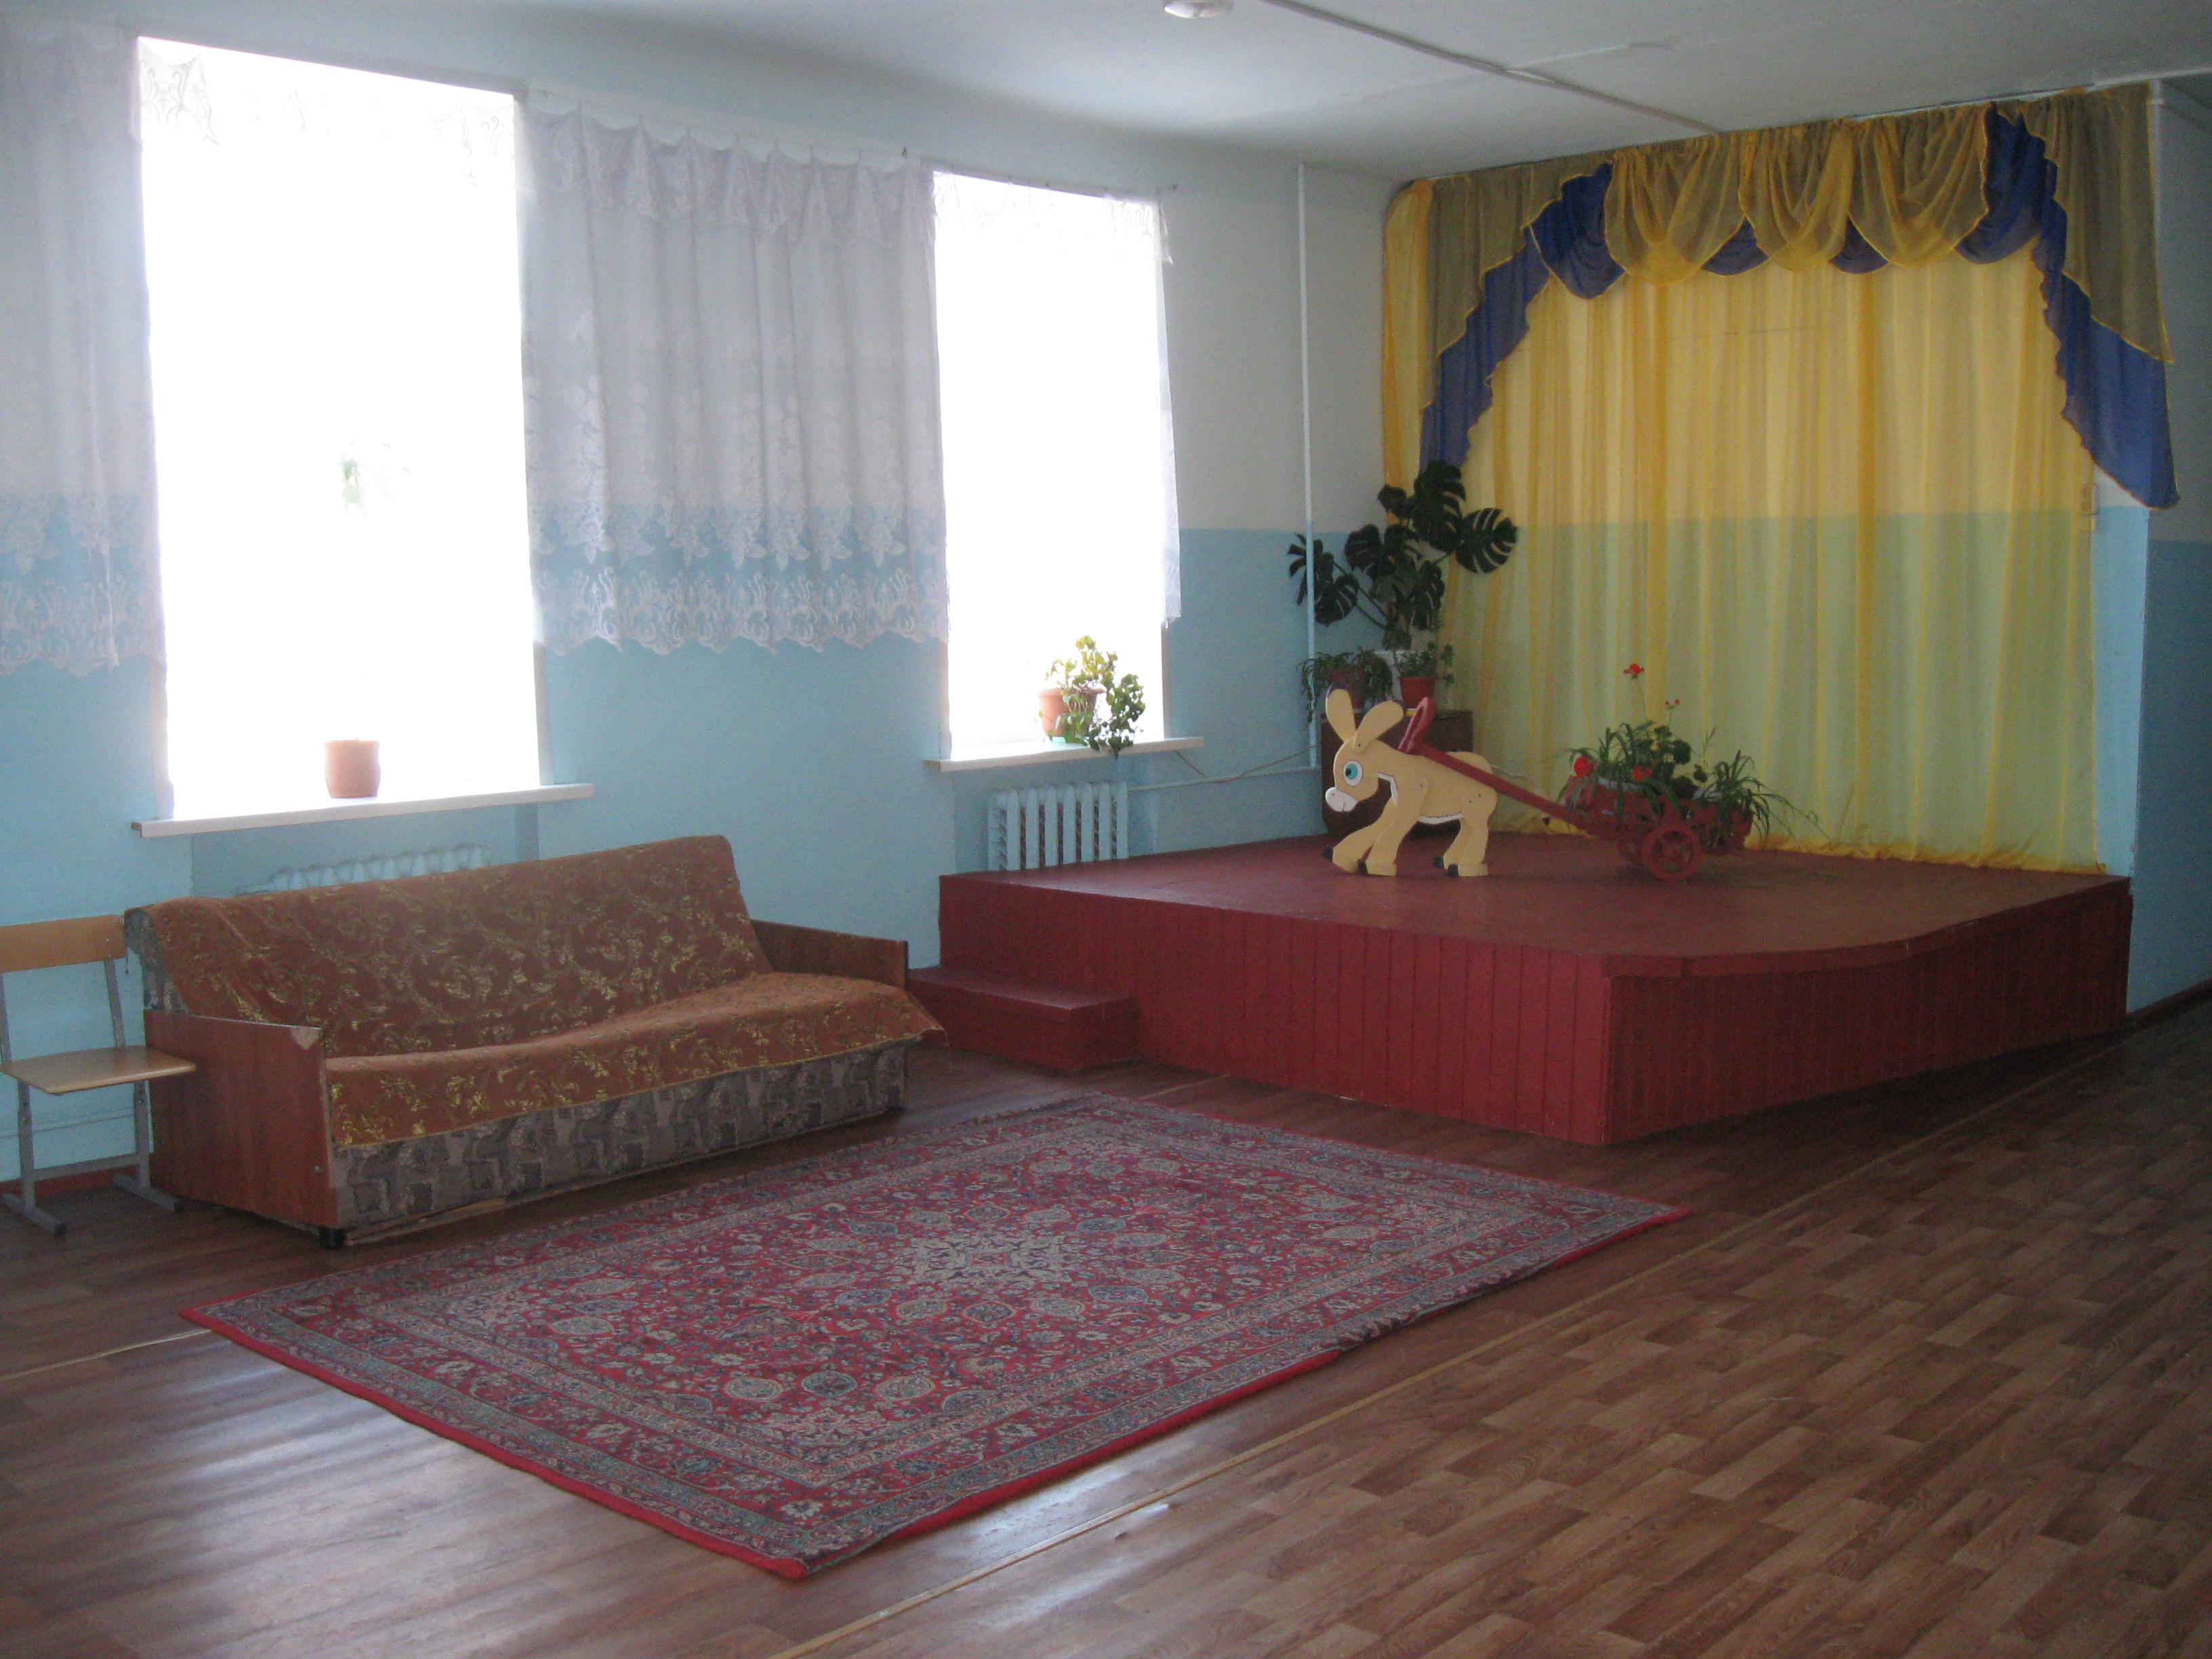 http://img-fotki.yandex.ru/get/5104/198507022.3/0_10b410_ac3d39cb_orig